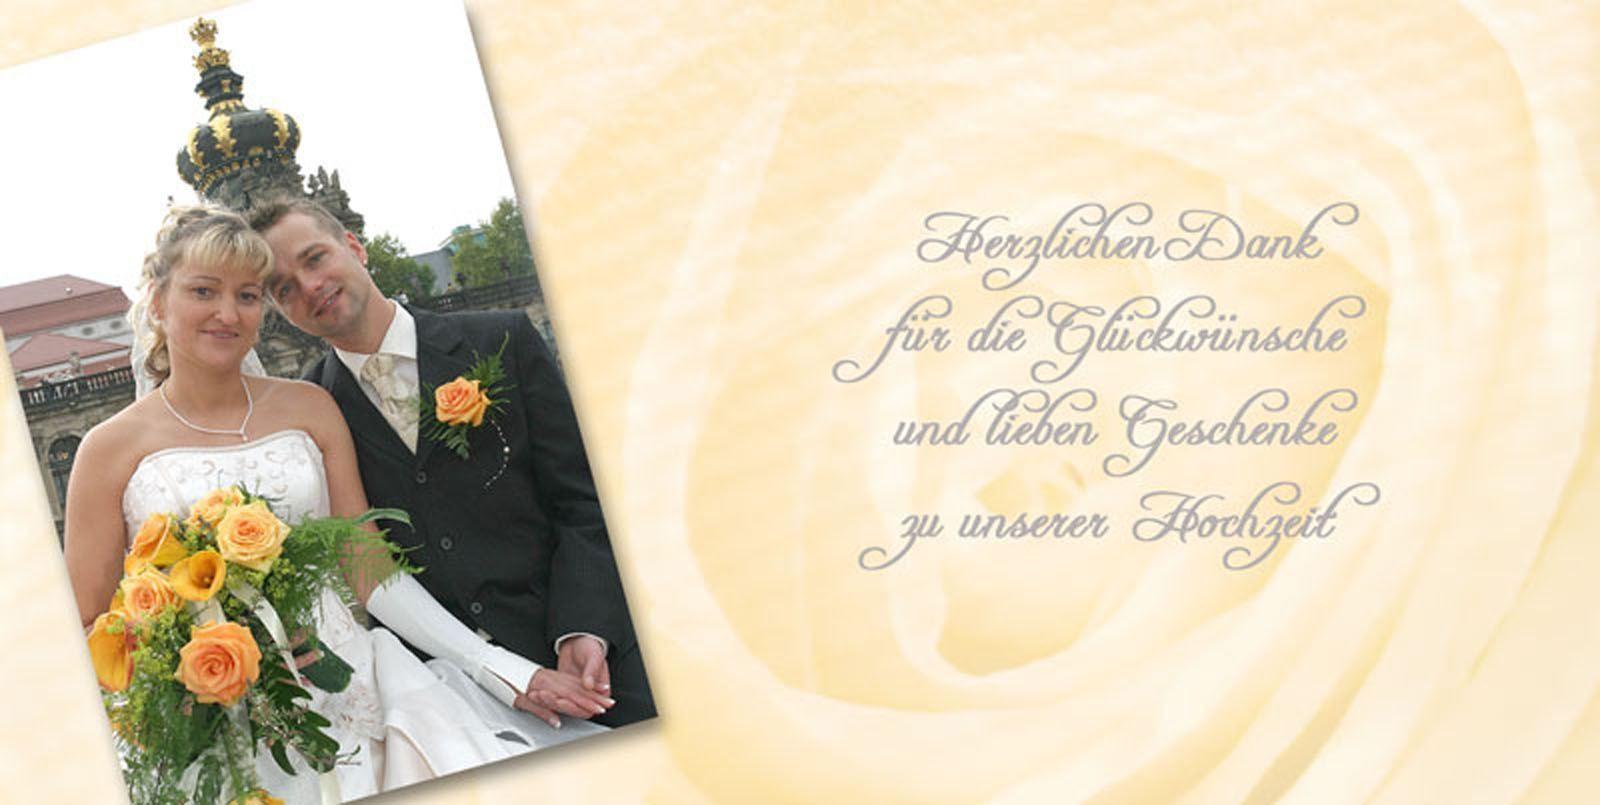 Dankeskarte Hochzeit Text  Dankeskarte Hochzeit Text Danksagung Hochzeit Text